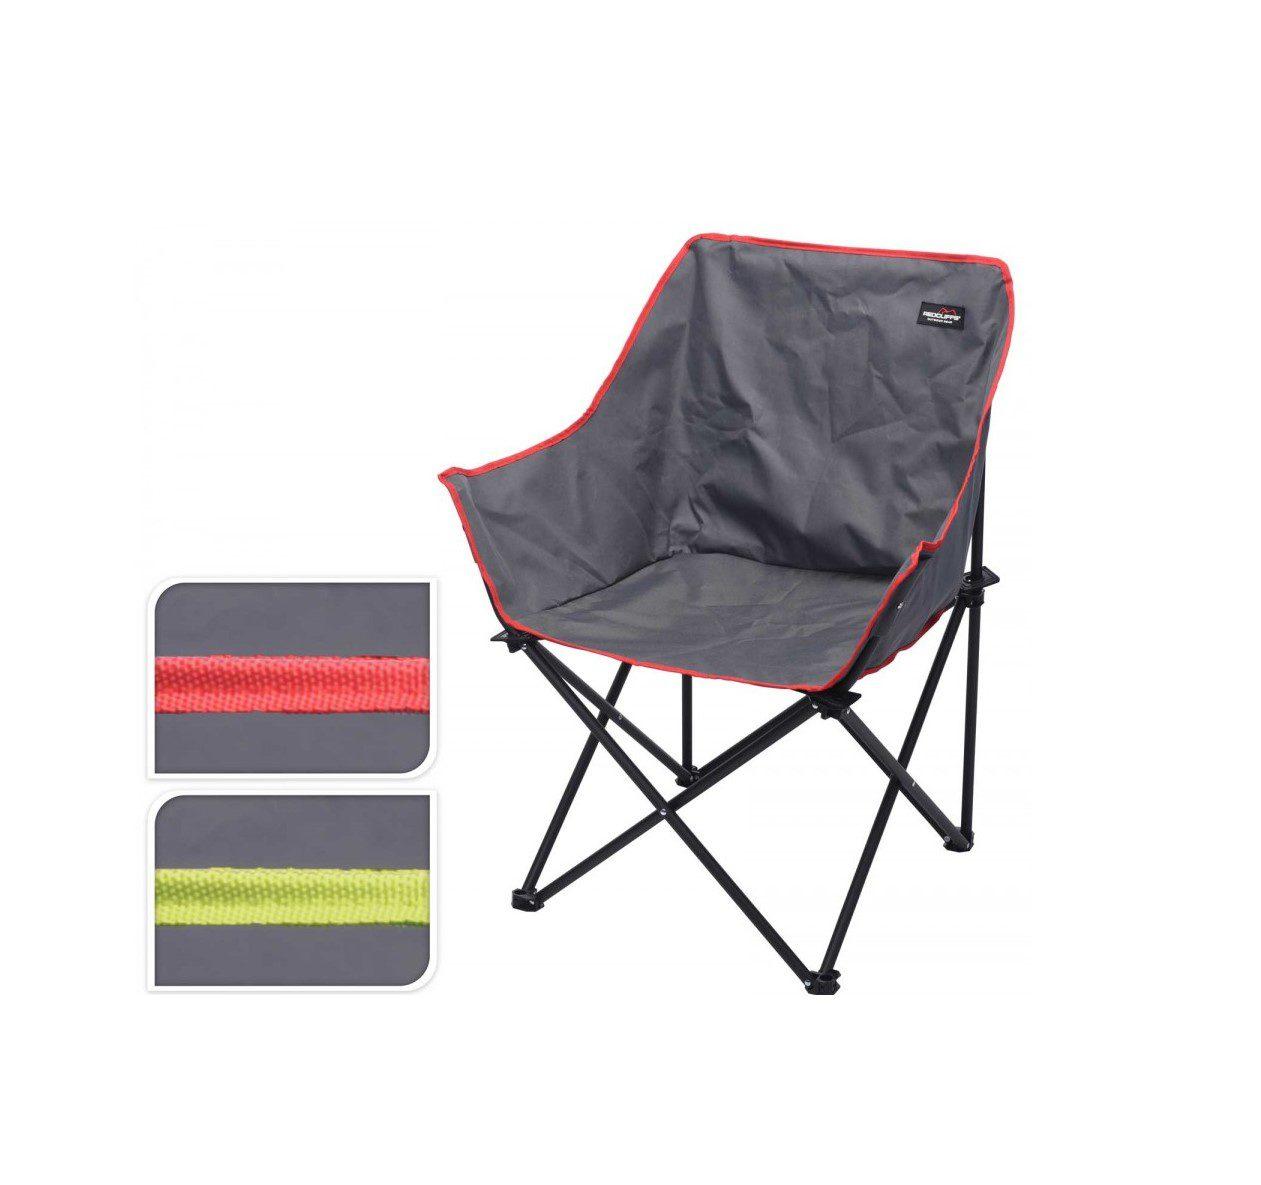 Redcliffs Foldable Tub Chair